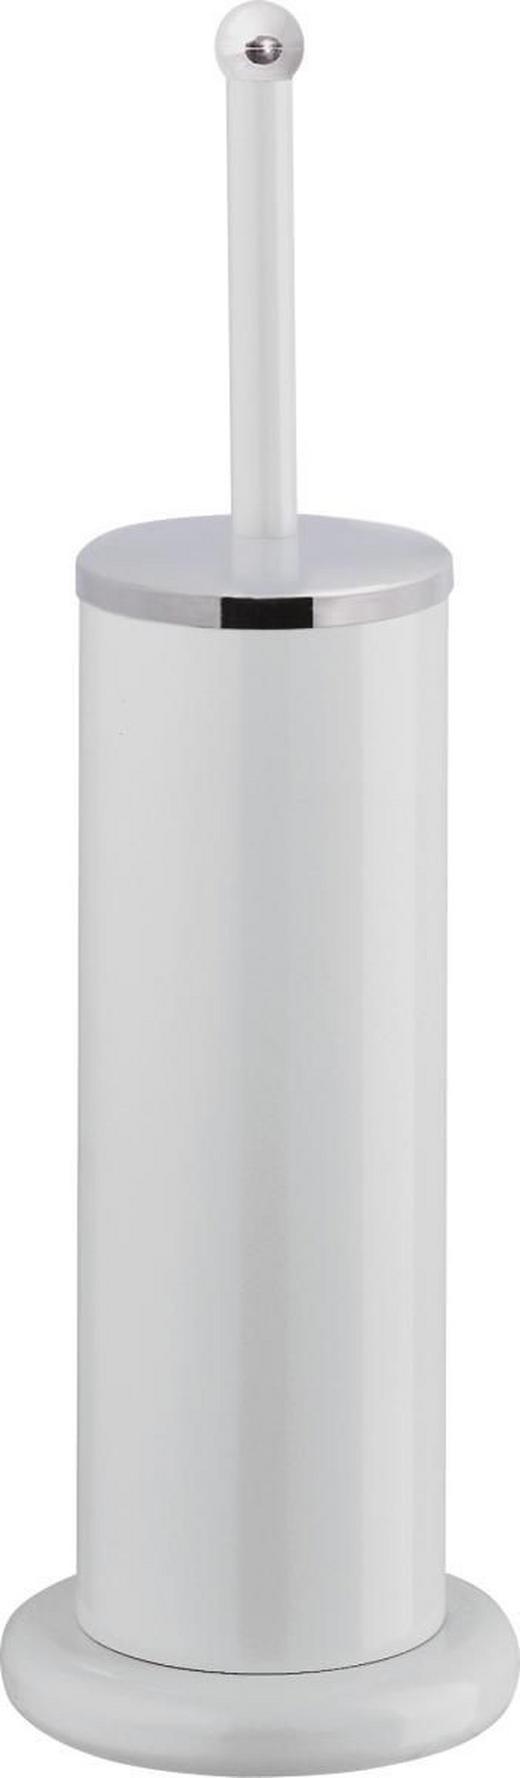 WC-BÜRSTENGARNITUR Metall - Weiß, Basics, Kunststoff/Metall (12.5/41cm)